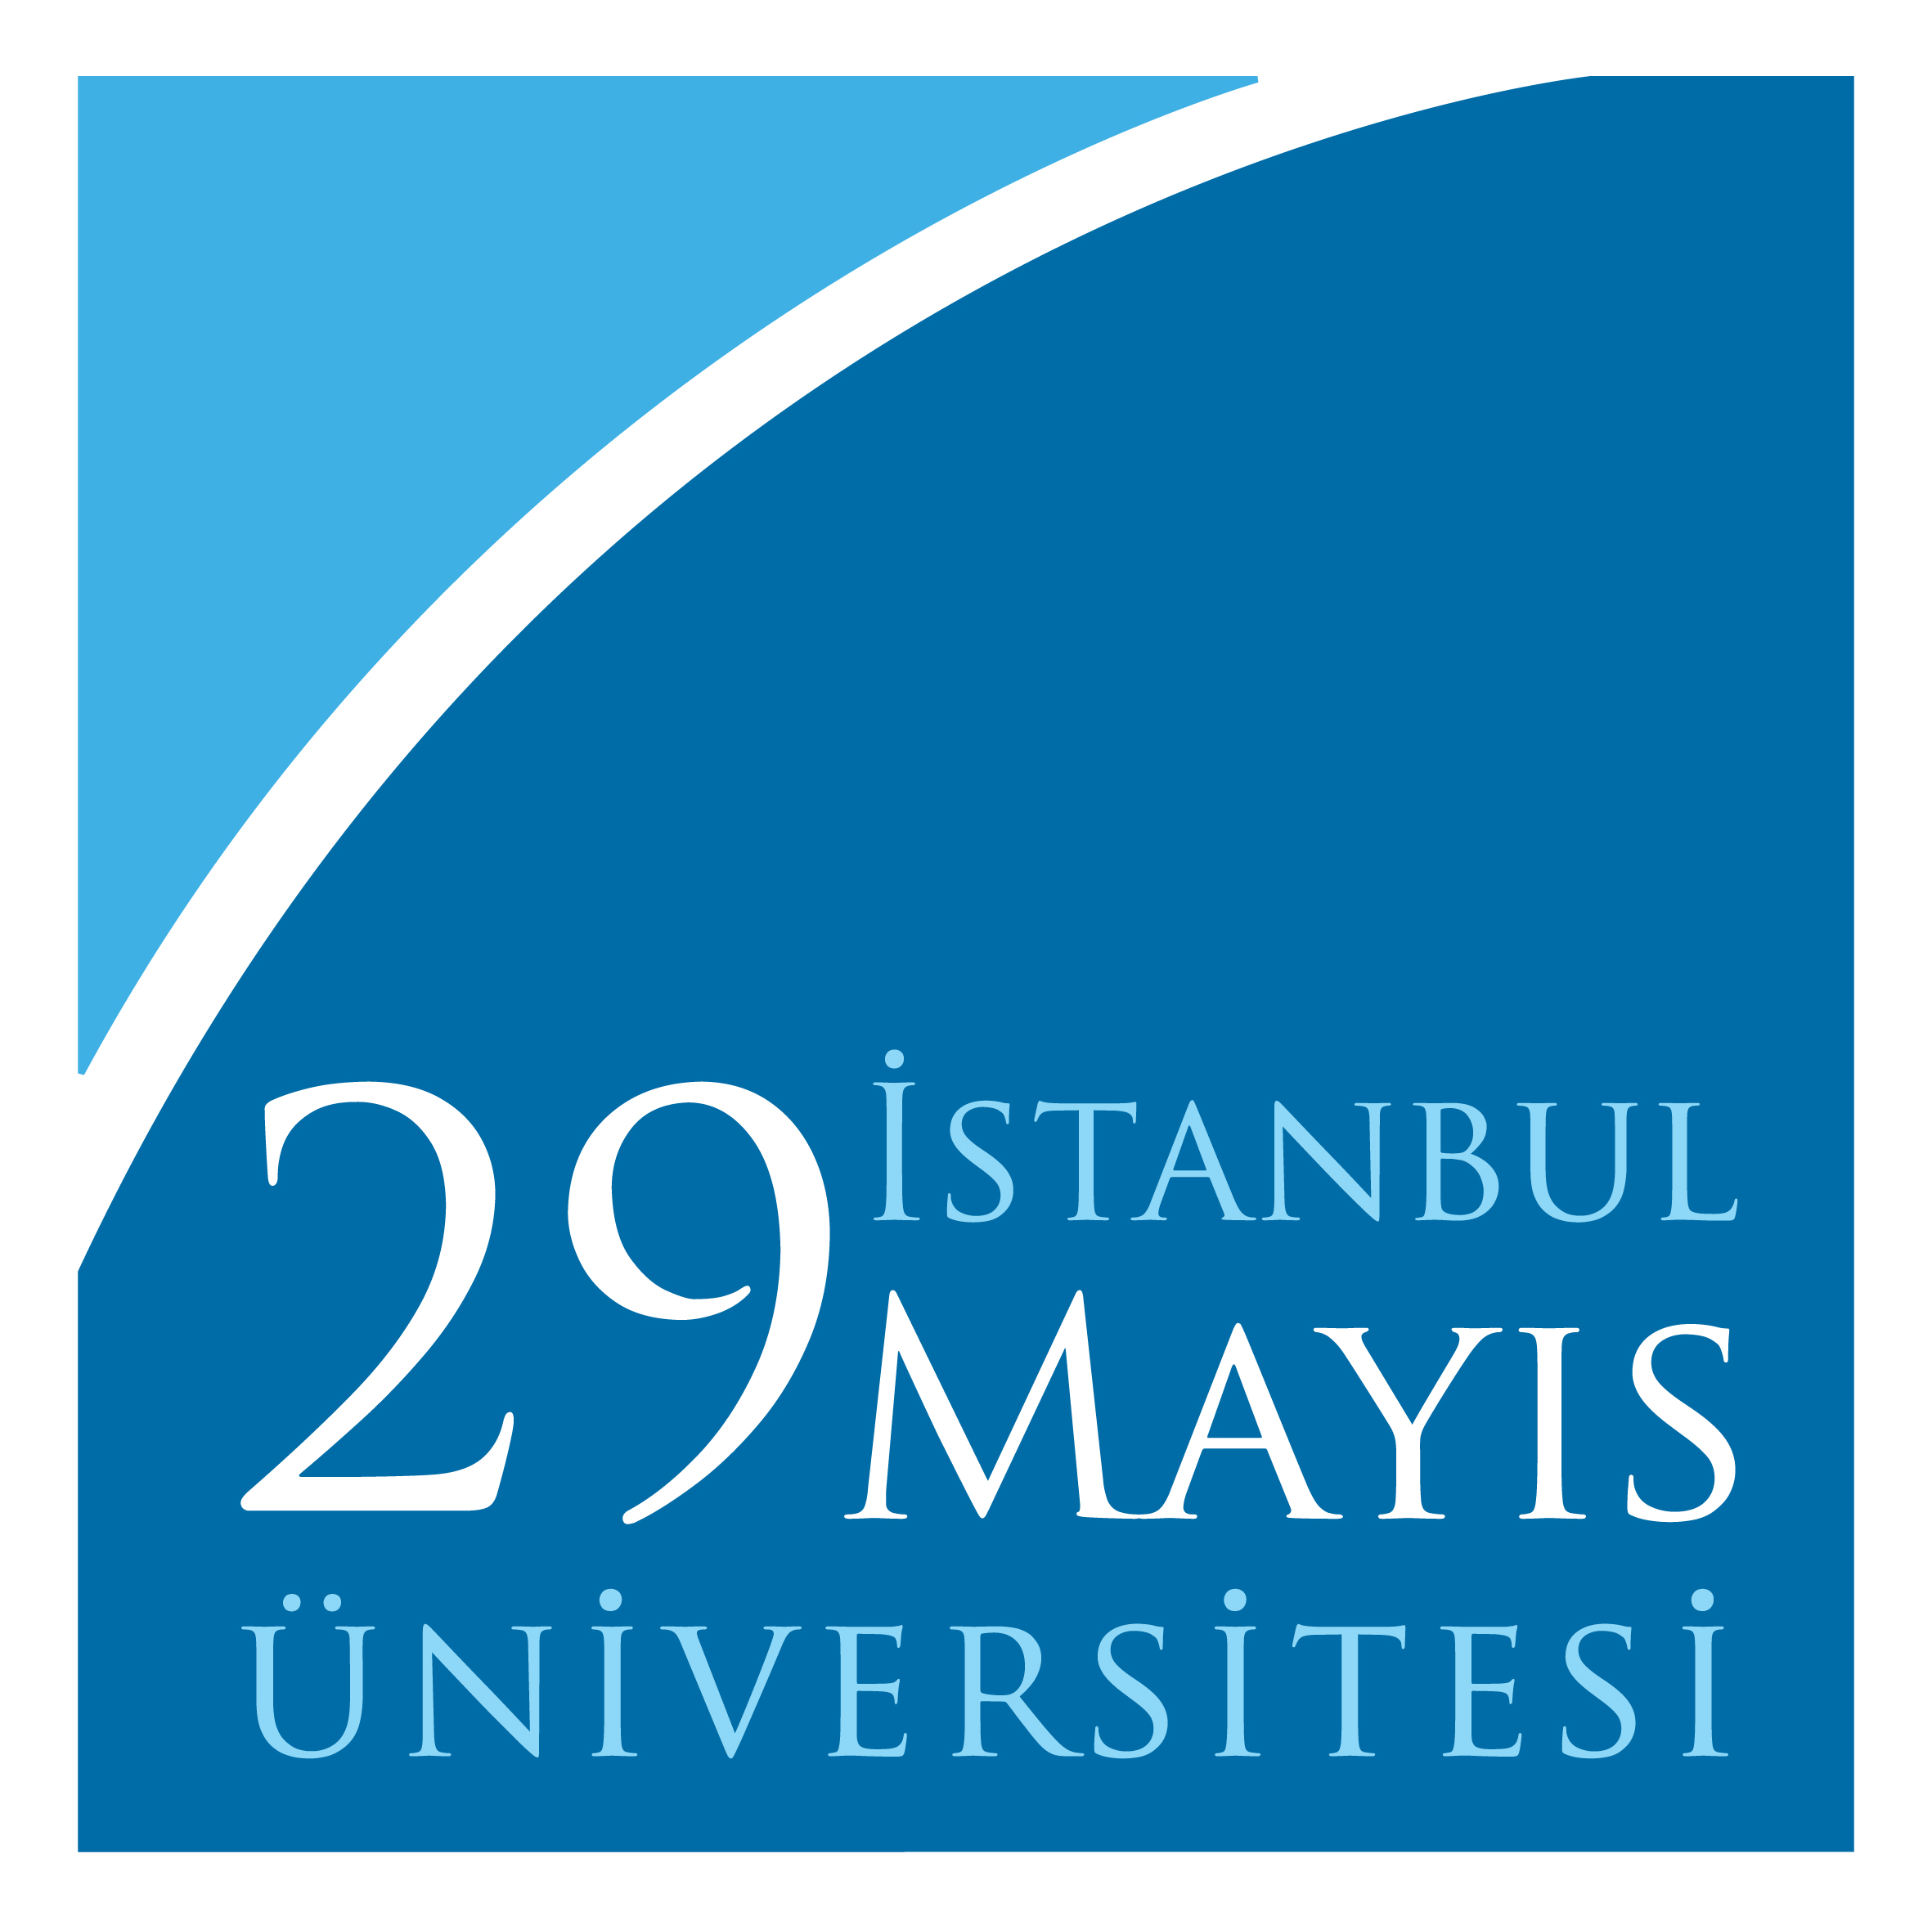 Istanbul 29 Mayıs University